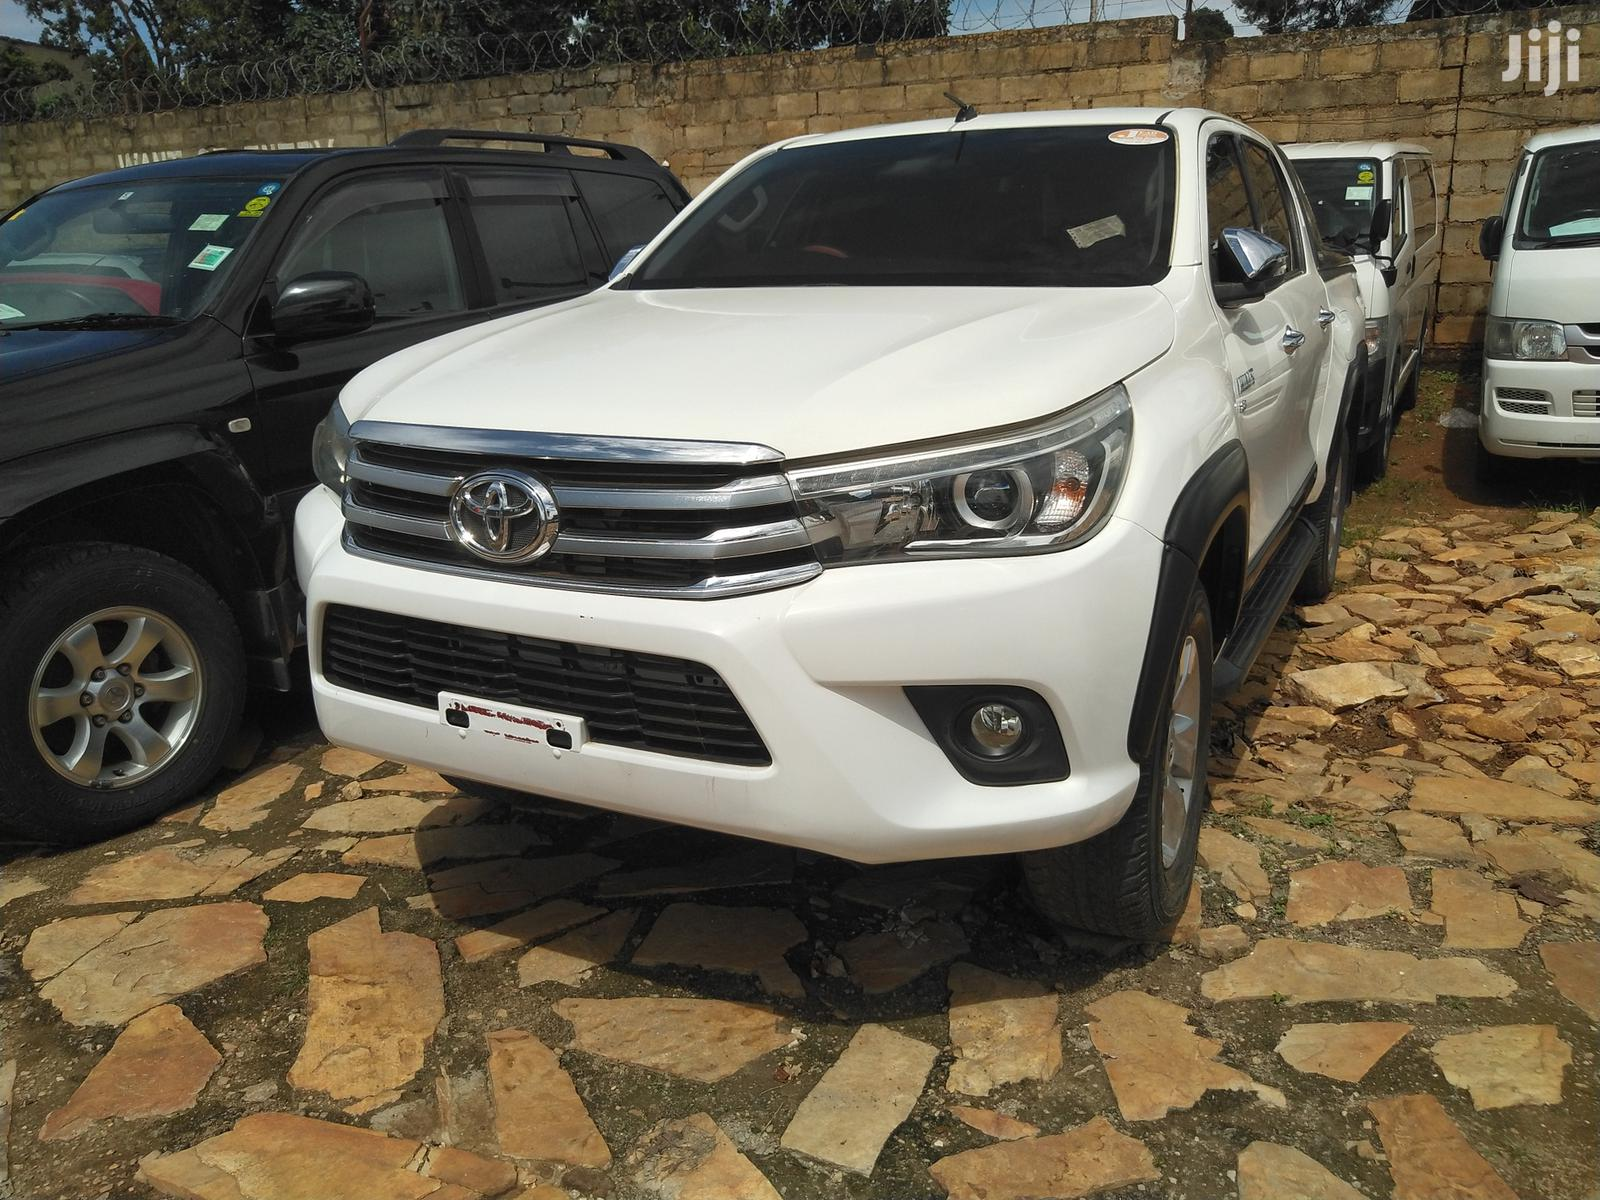 New Toyota Hilux 2015 White